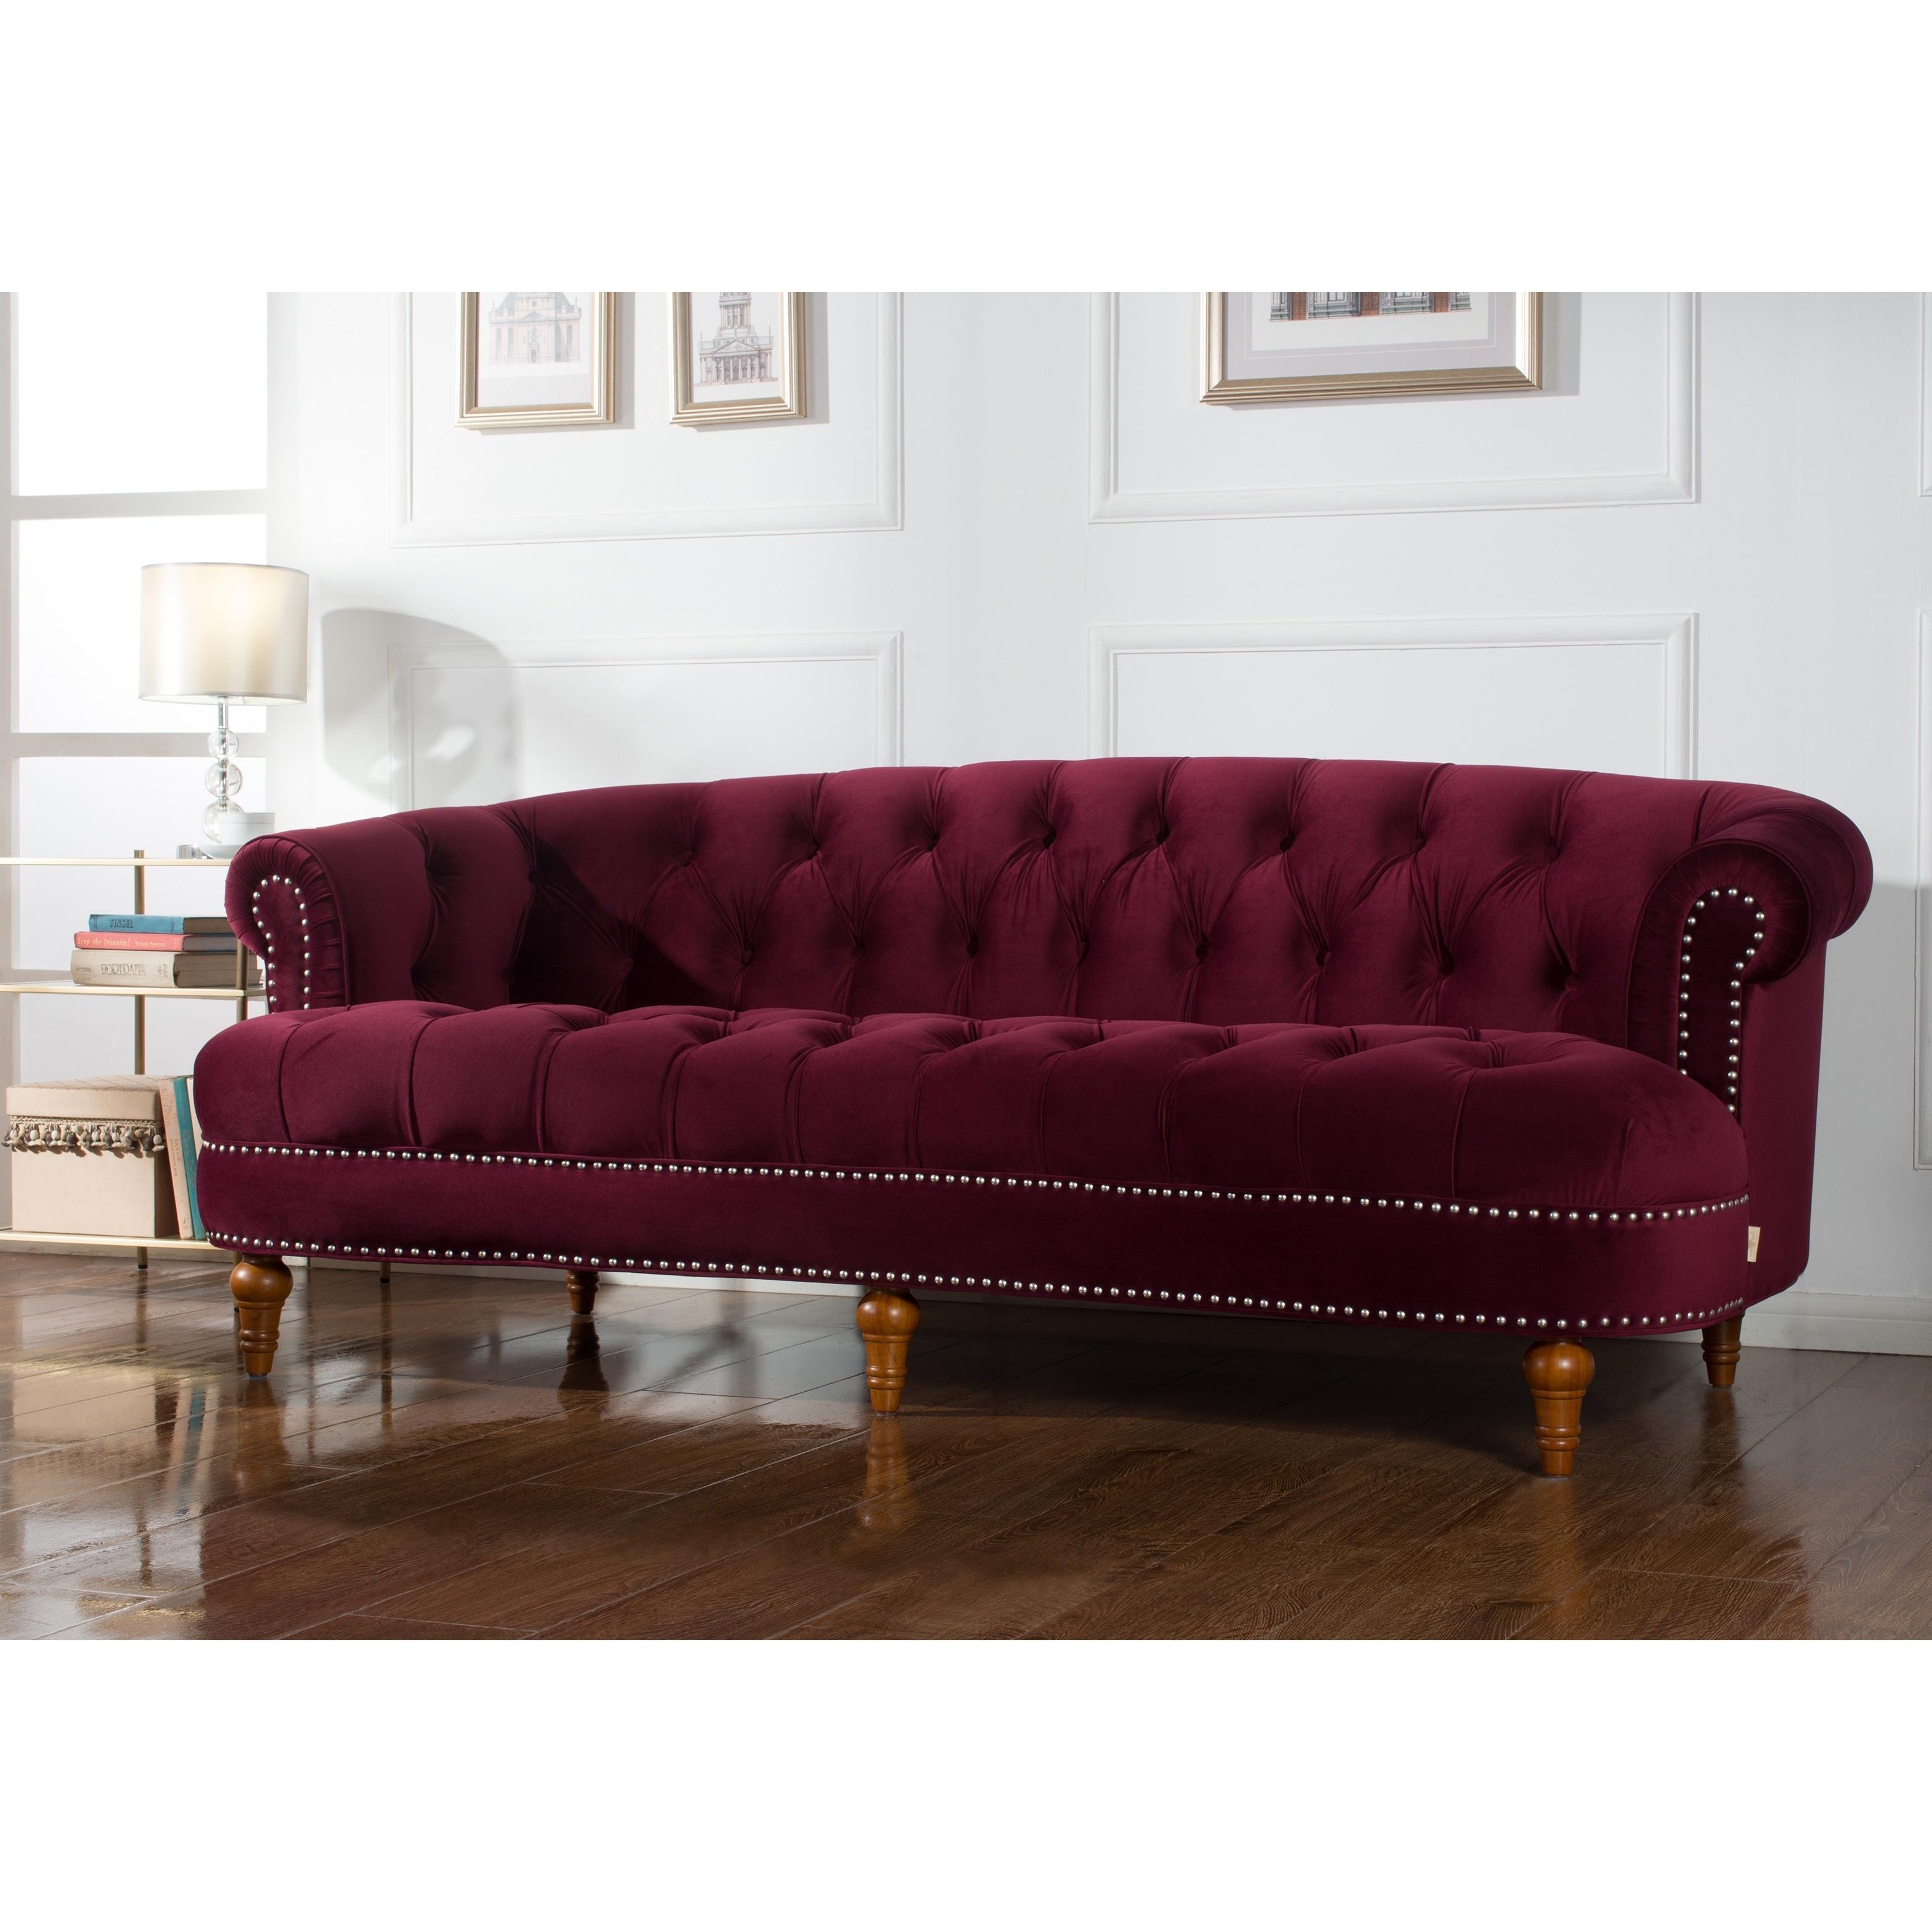 Jennifer Taylor La Rosa Chesterfield Sofa Free Shipping Today  ~ Oversized Chesterfield Sofa